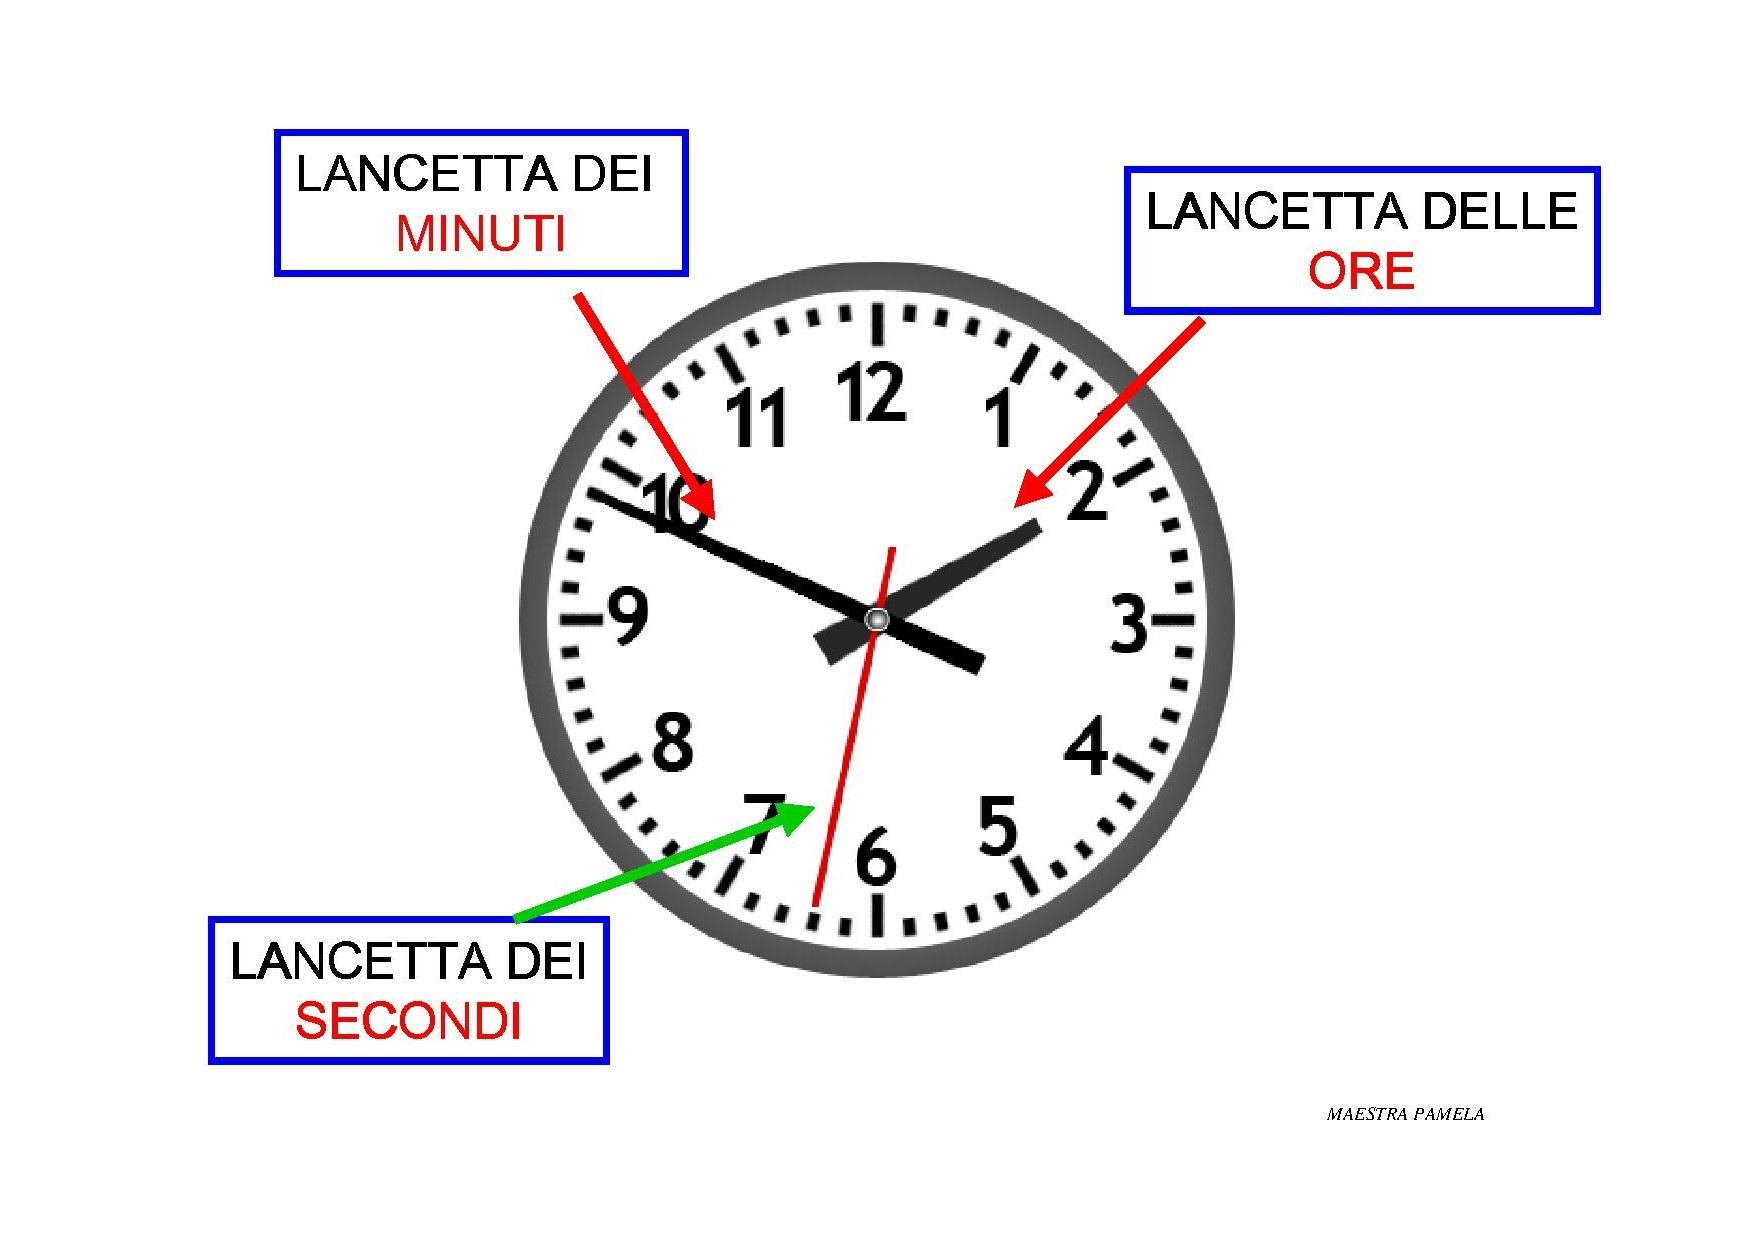 Popolare LEGGERE L'OROLOGIO – ESERCIZIO ON LINE | MAESTRA PAMELA HI33